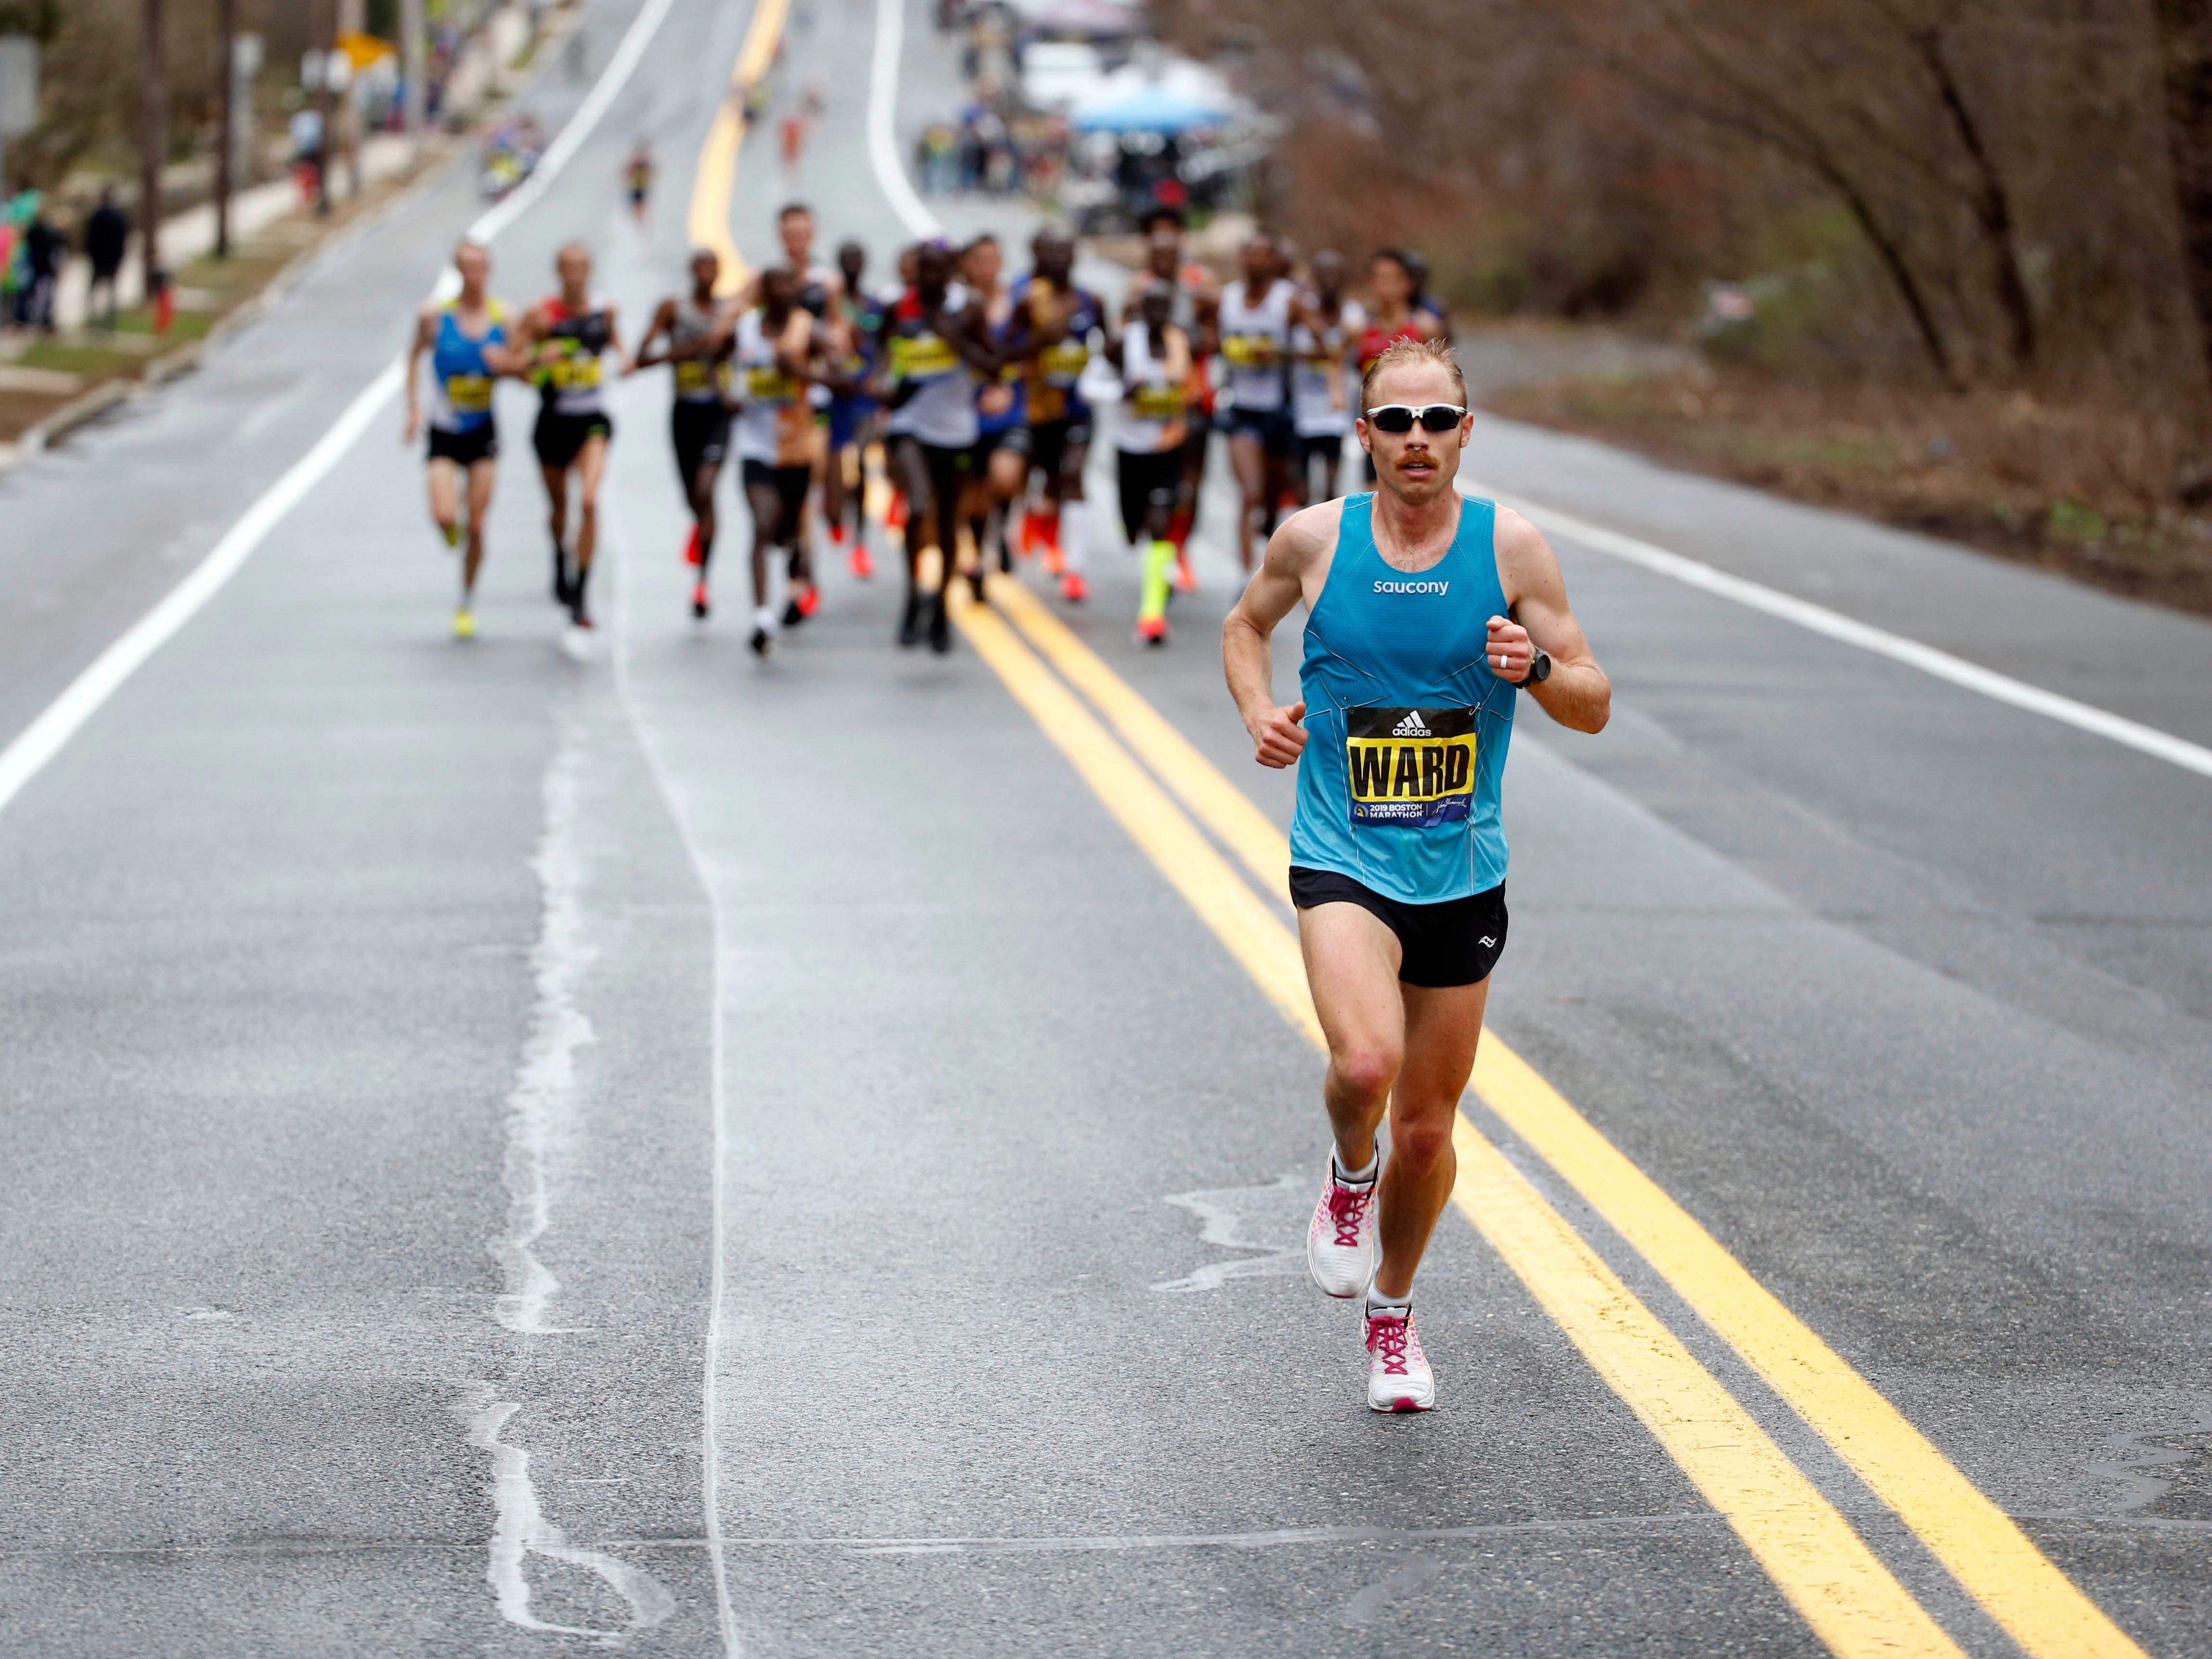 Jared Ward (USA) leads during the 2019 Boston Marathon.